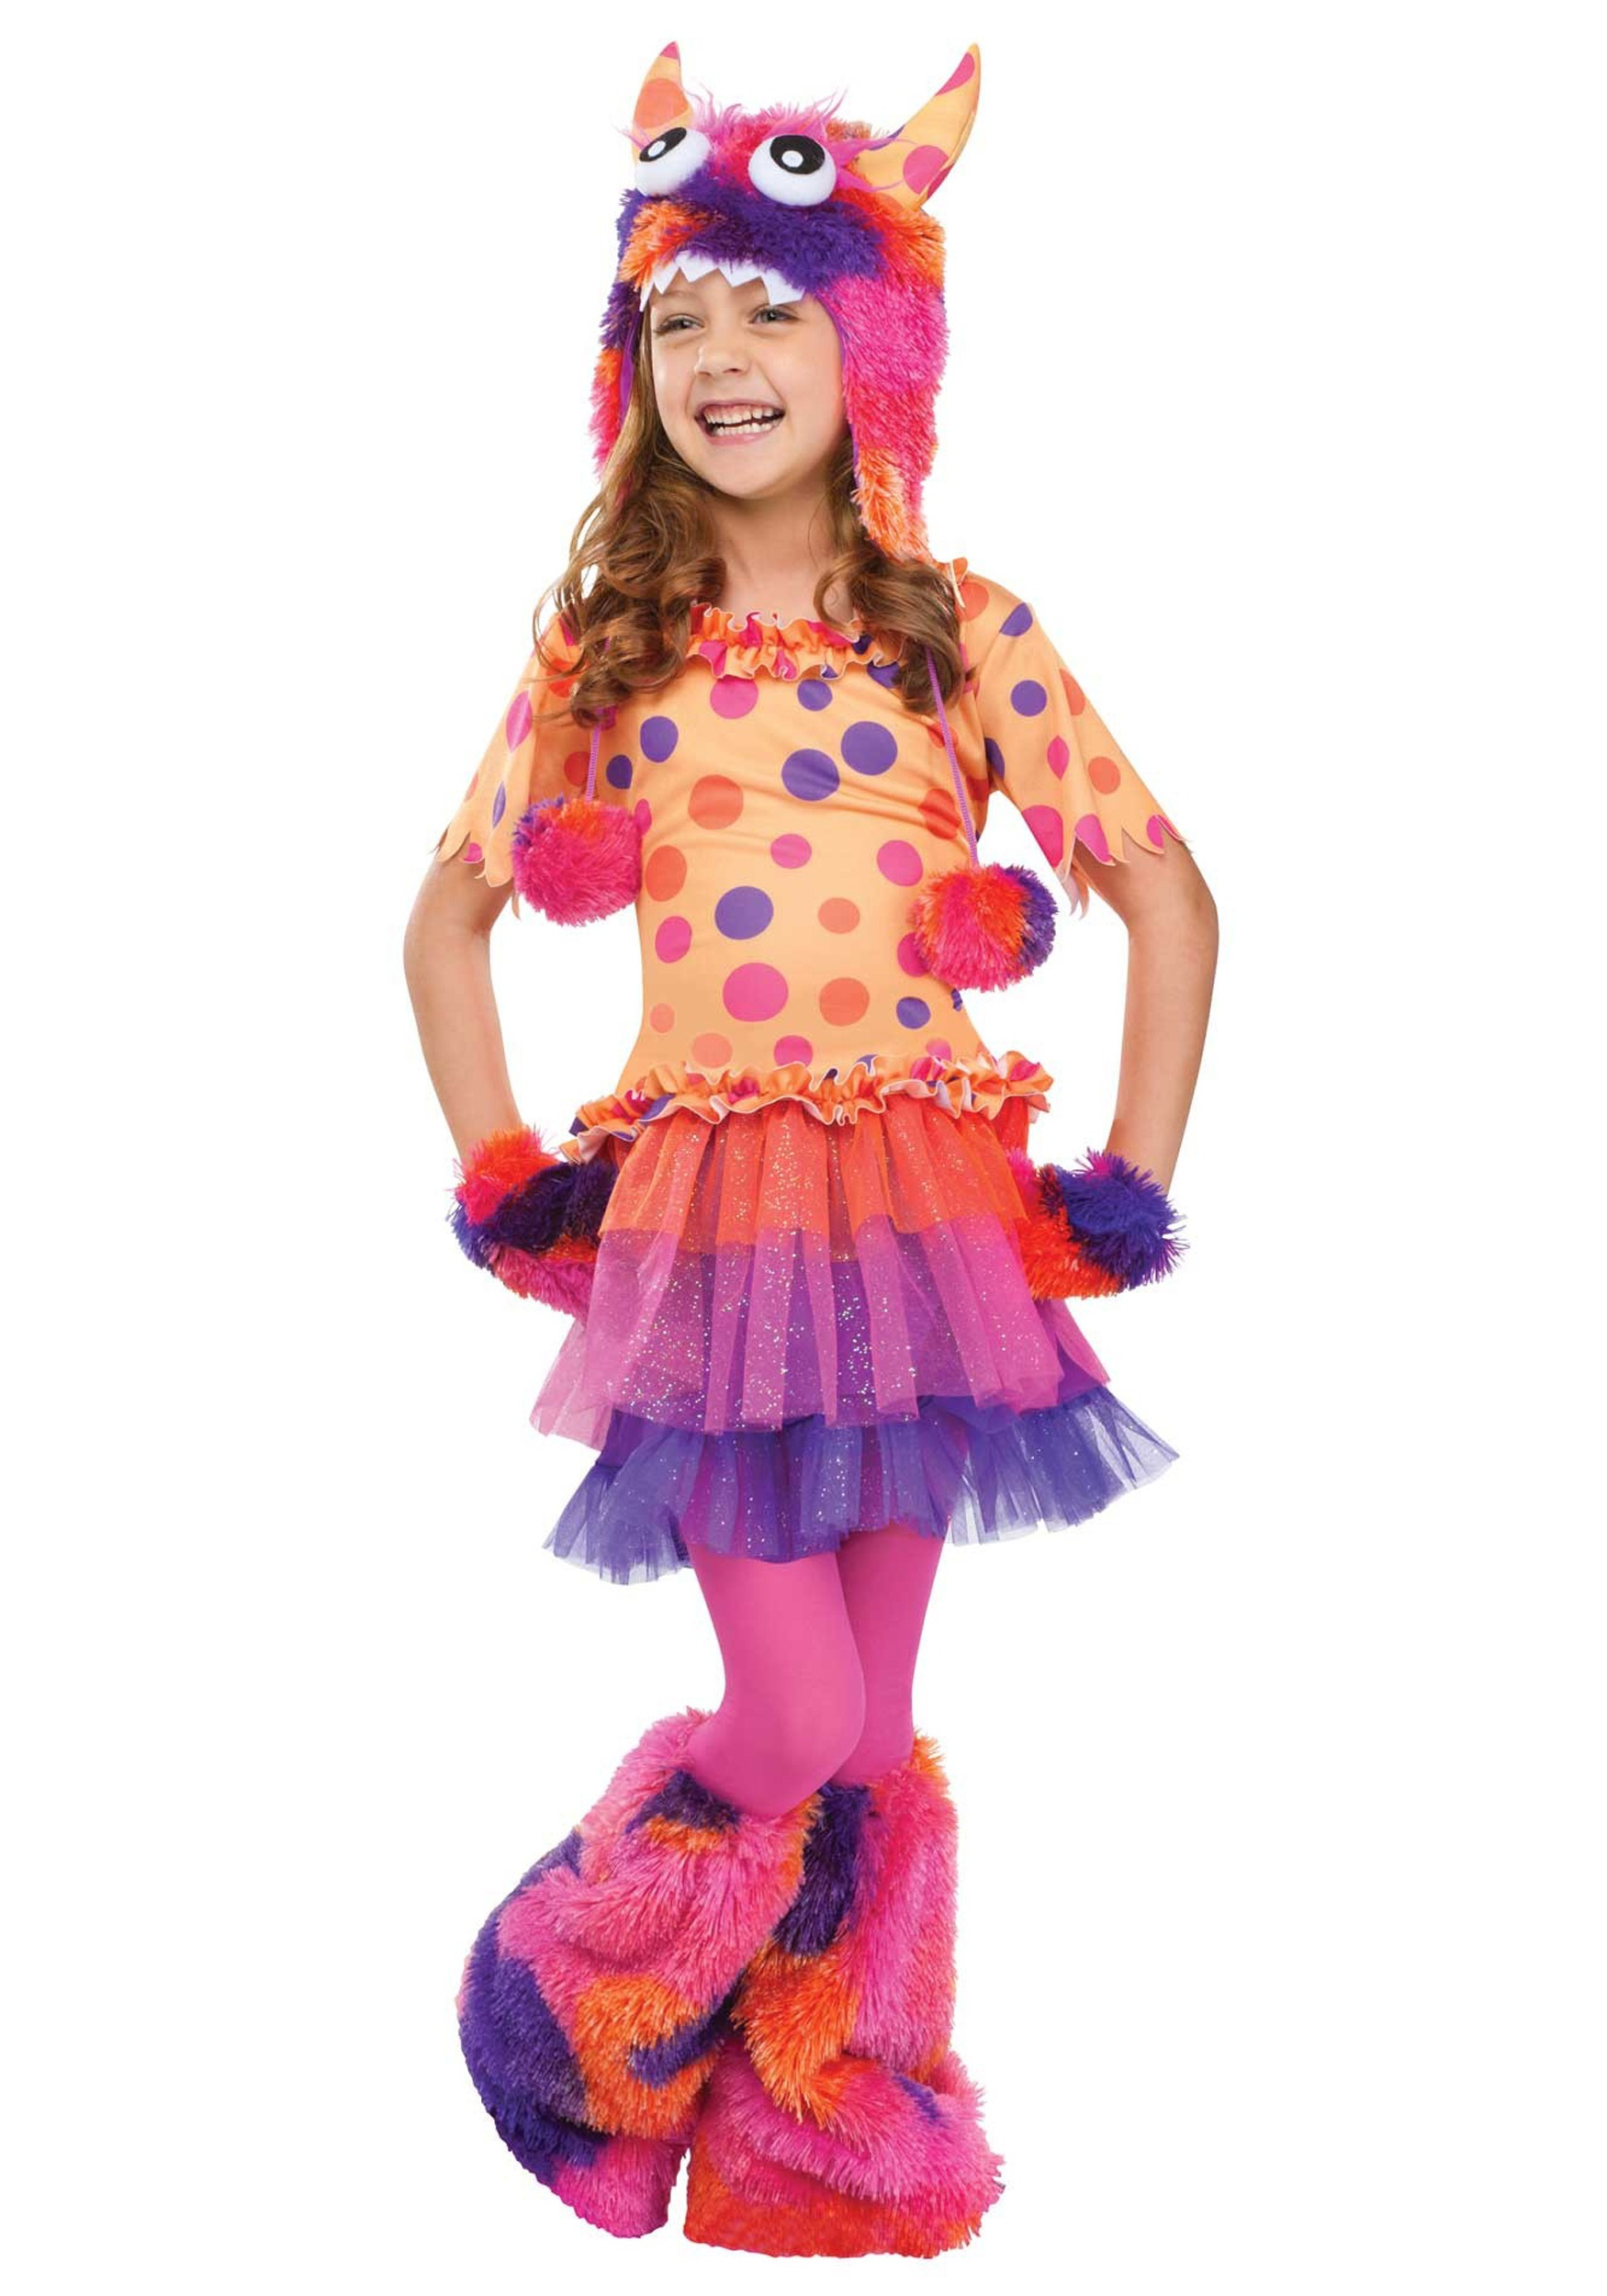 Girls Fuzzy Fifi Monster Costume  sc 1 st  Halloween Costumes & Girls Fuzzy Fifi Monster Costume - Halloween Costumes